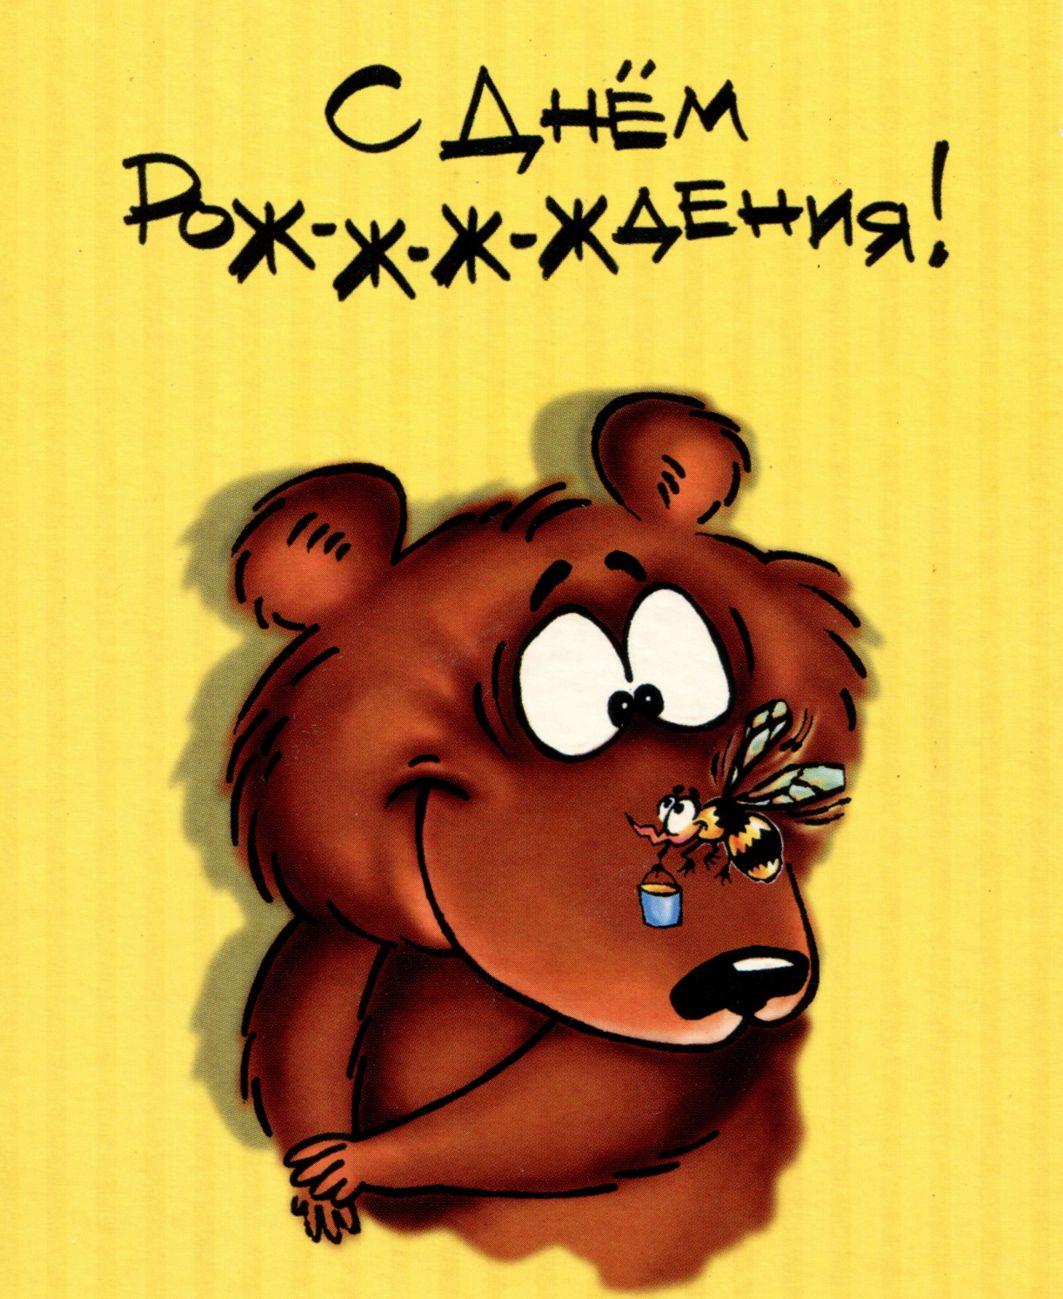 Брата, картинка с днем рождения с медведем